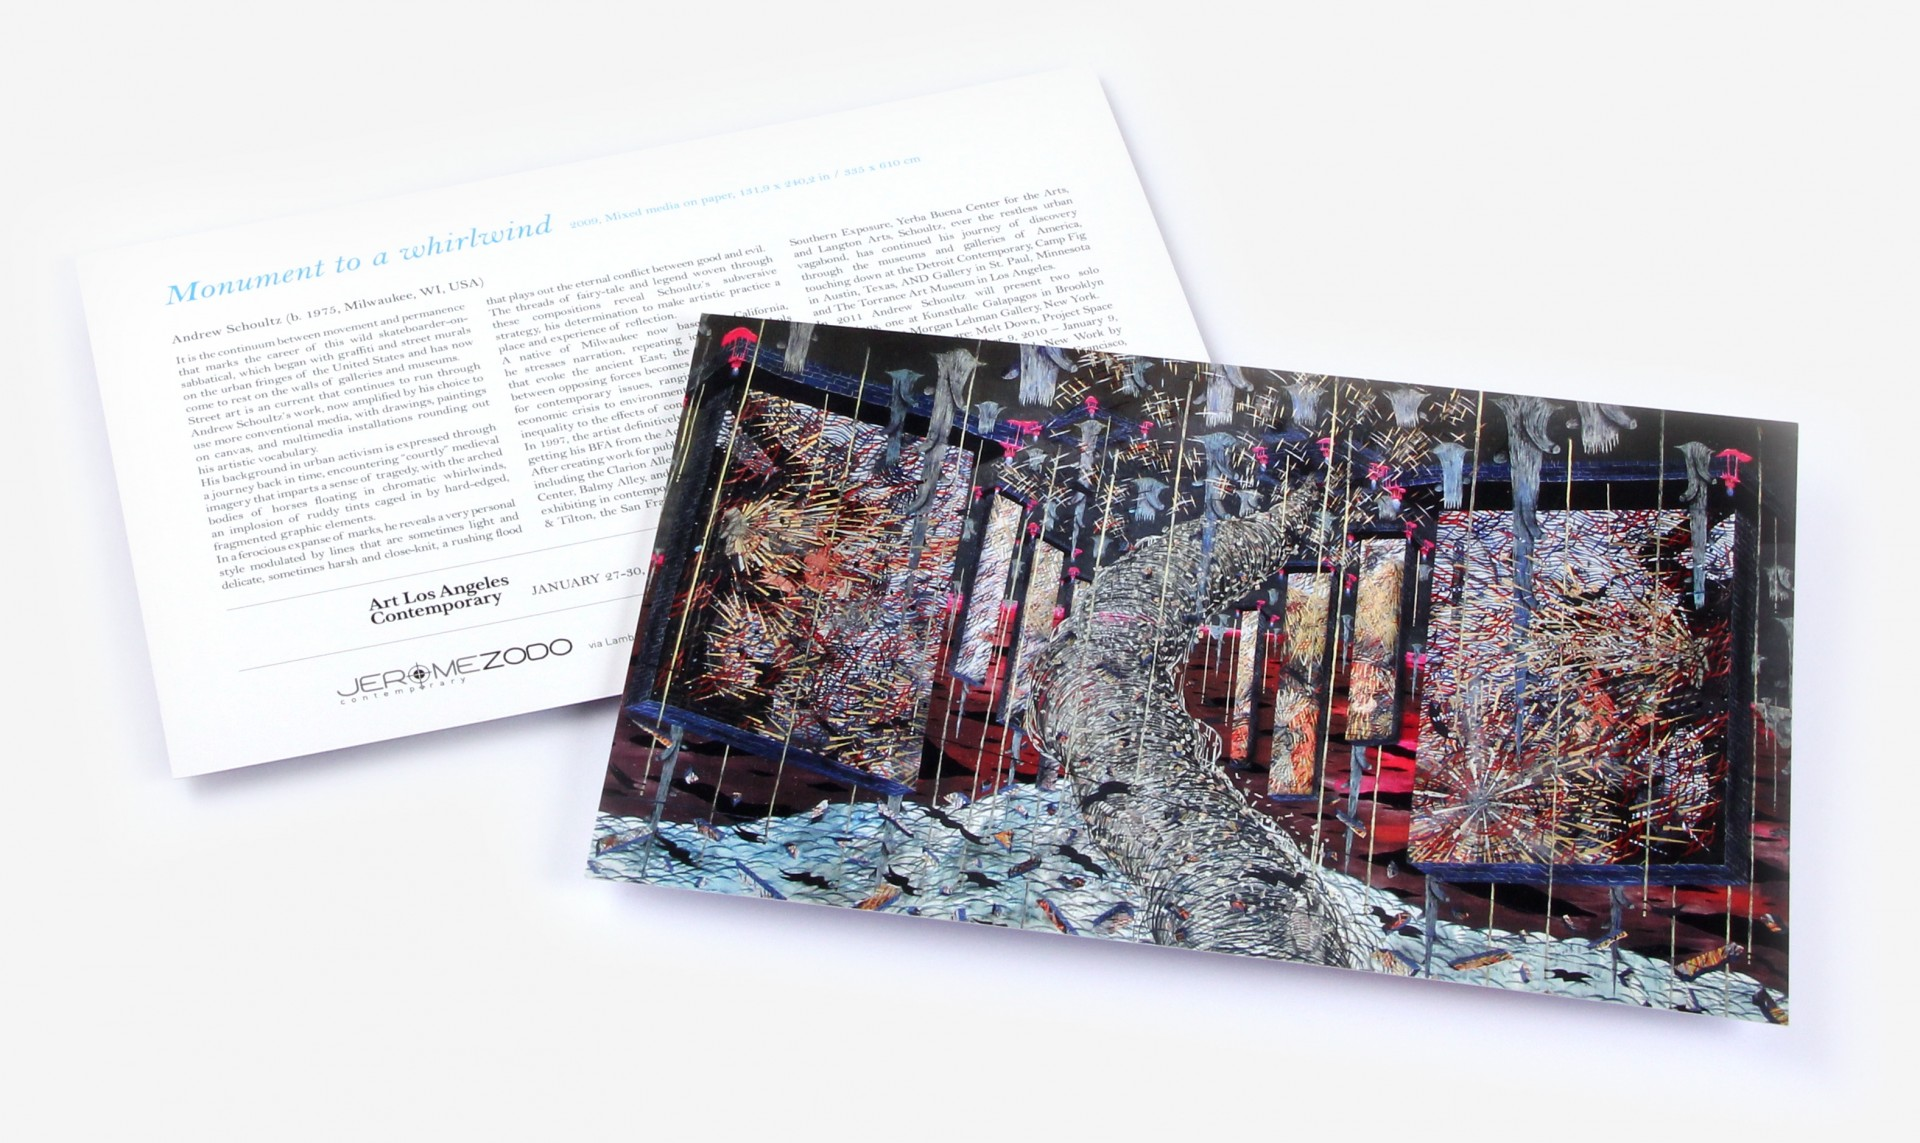 Andrew Shoultz - Crisis - Flyer